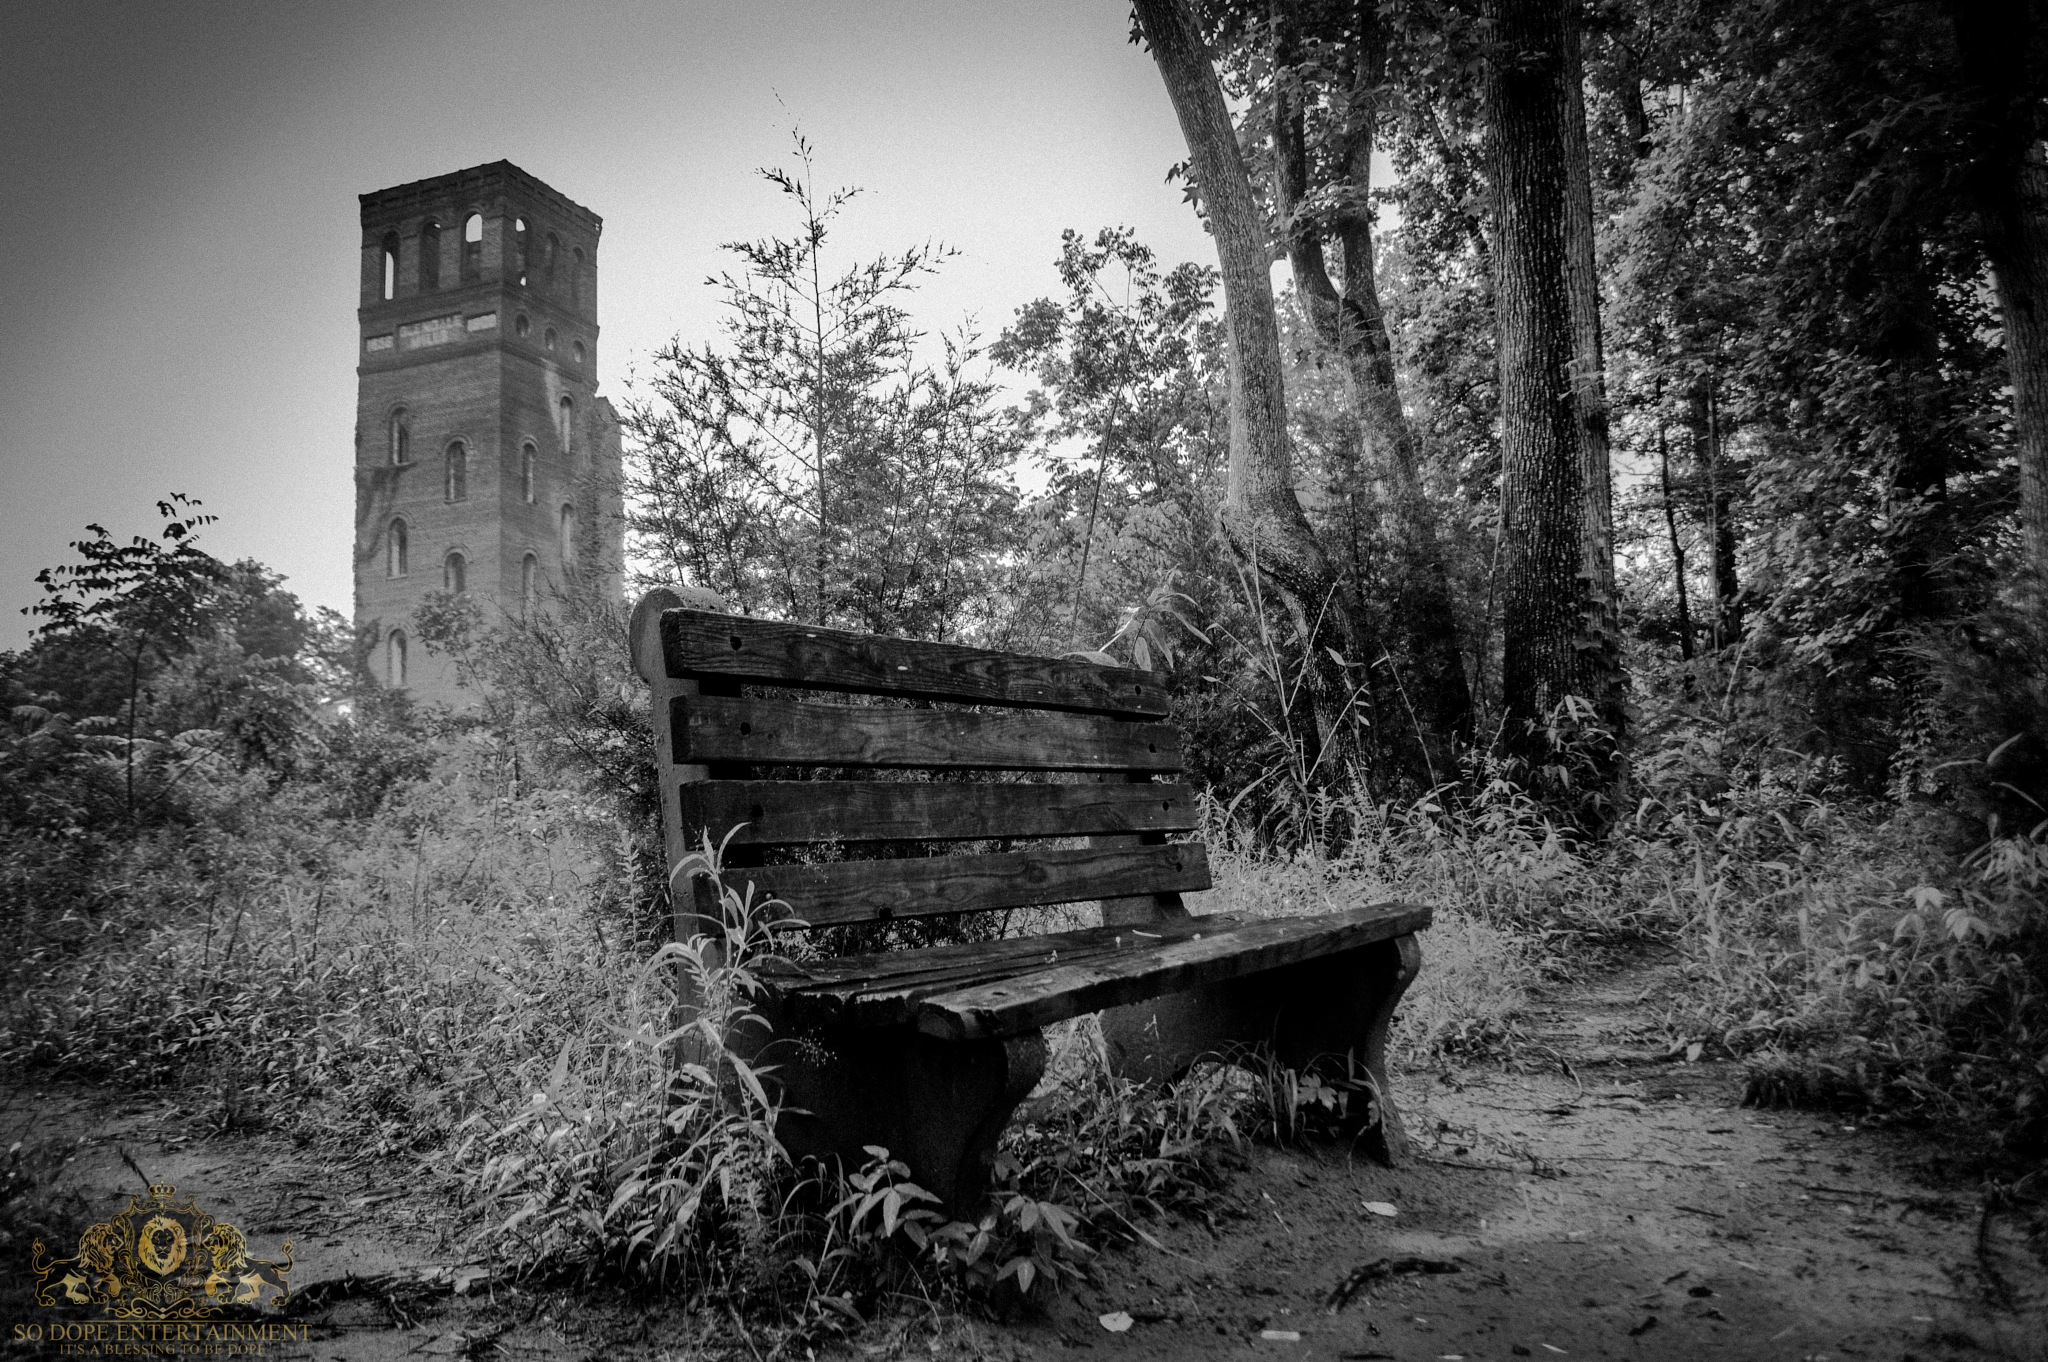 Bench & Ruins by Antonio Byrd